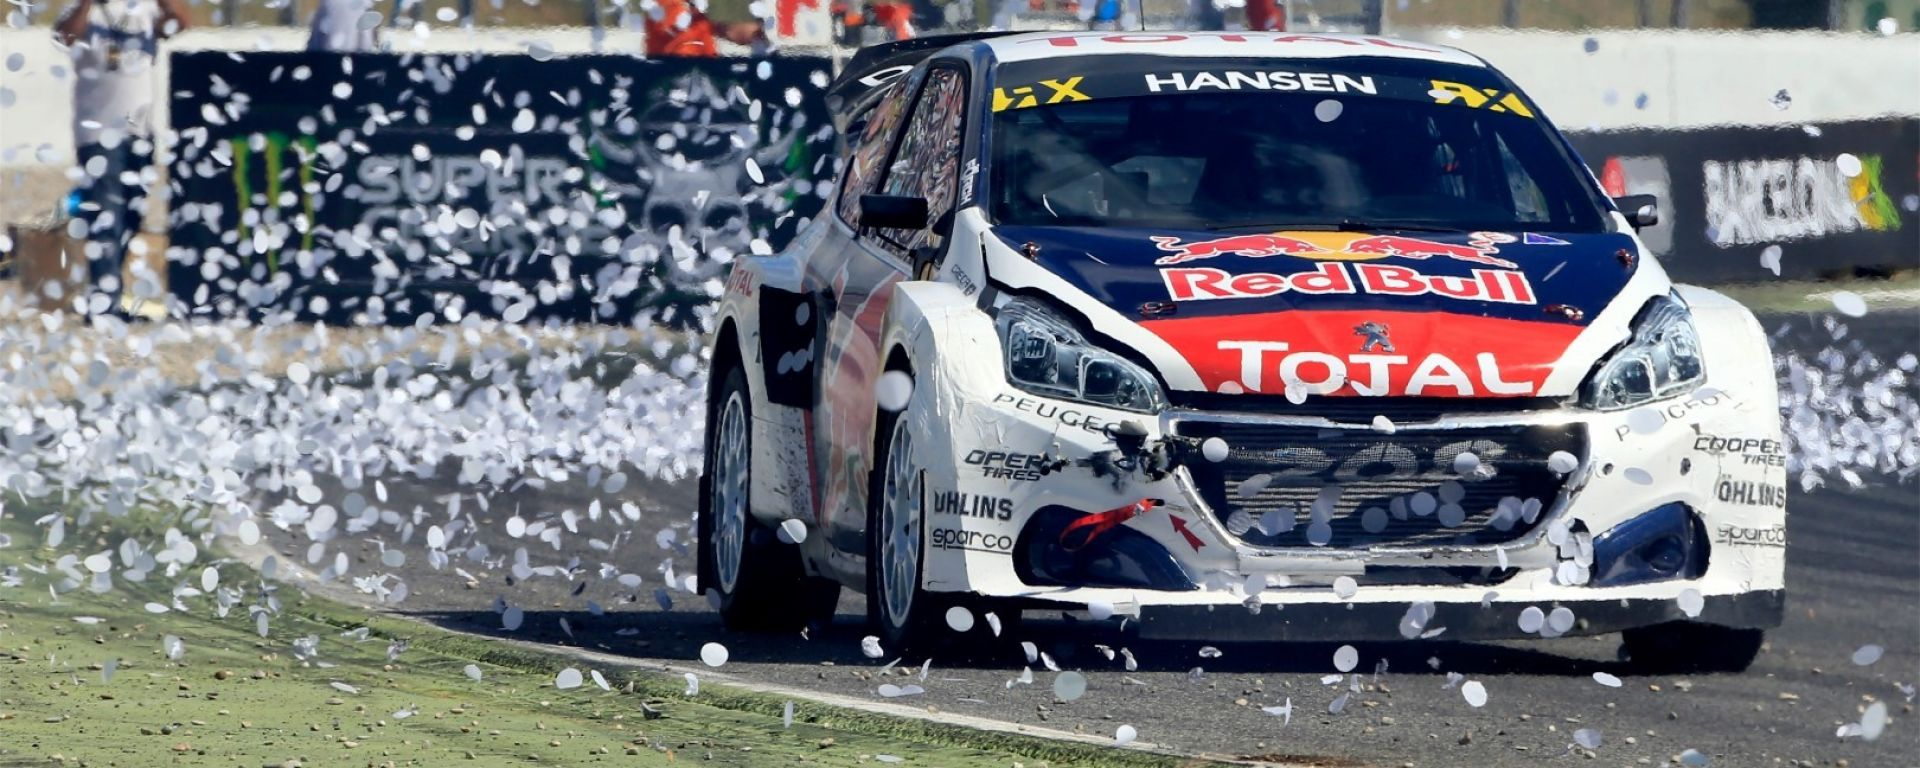 Team Hansen - Peugeot Sport